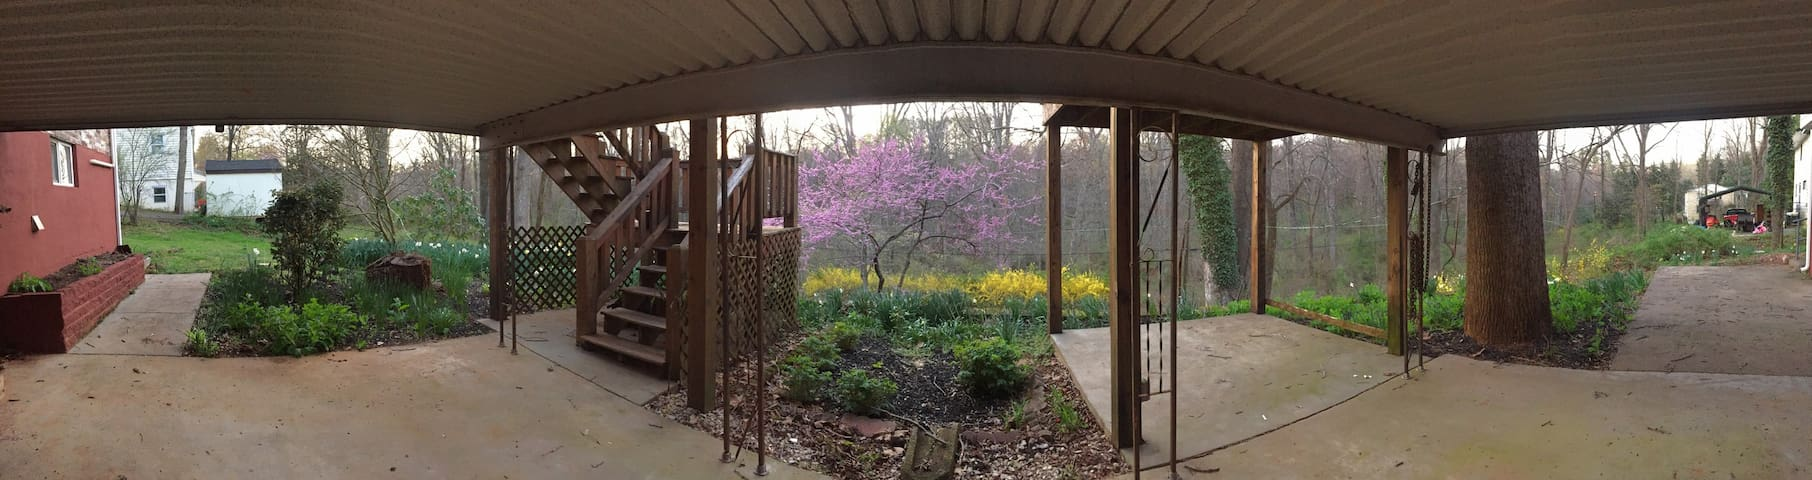 Quiet Cozy Dwelling Close to UVA - Charlottesville